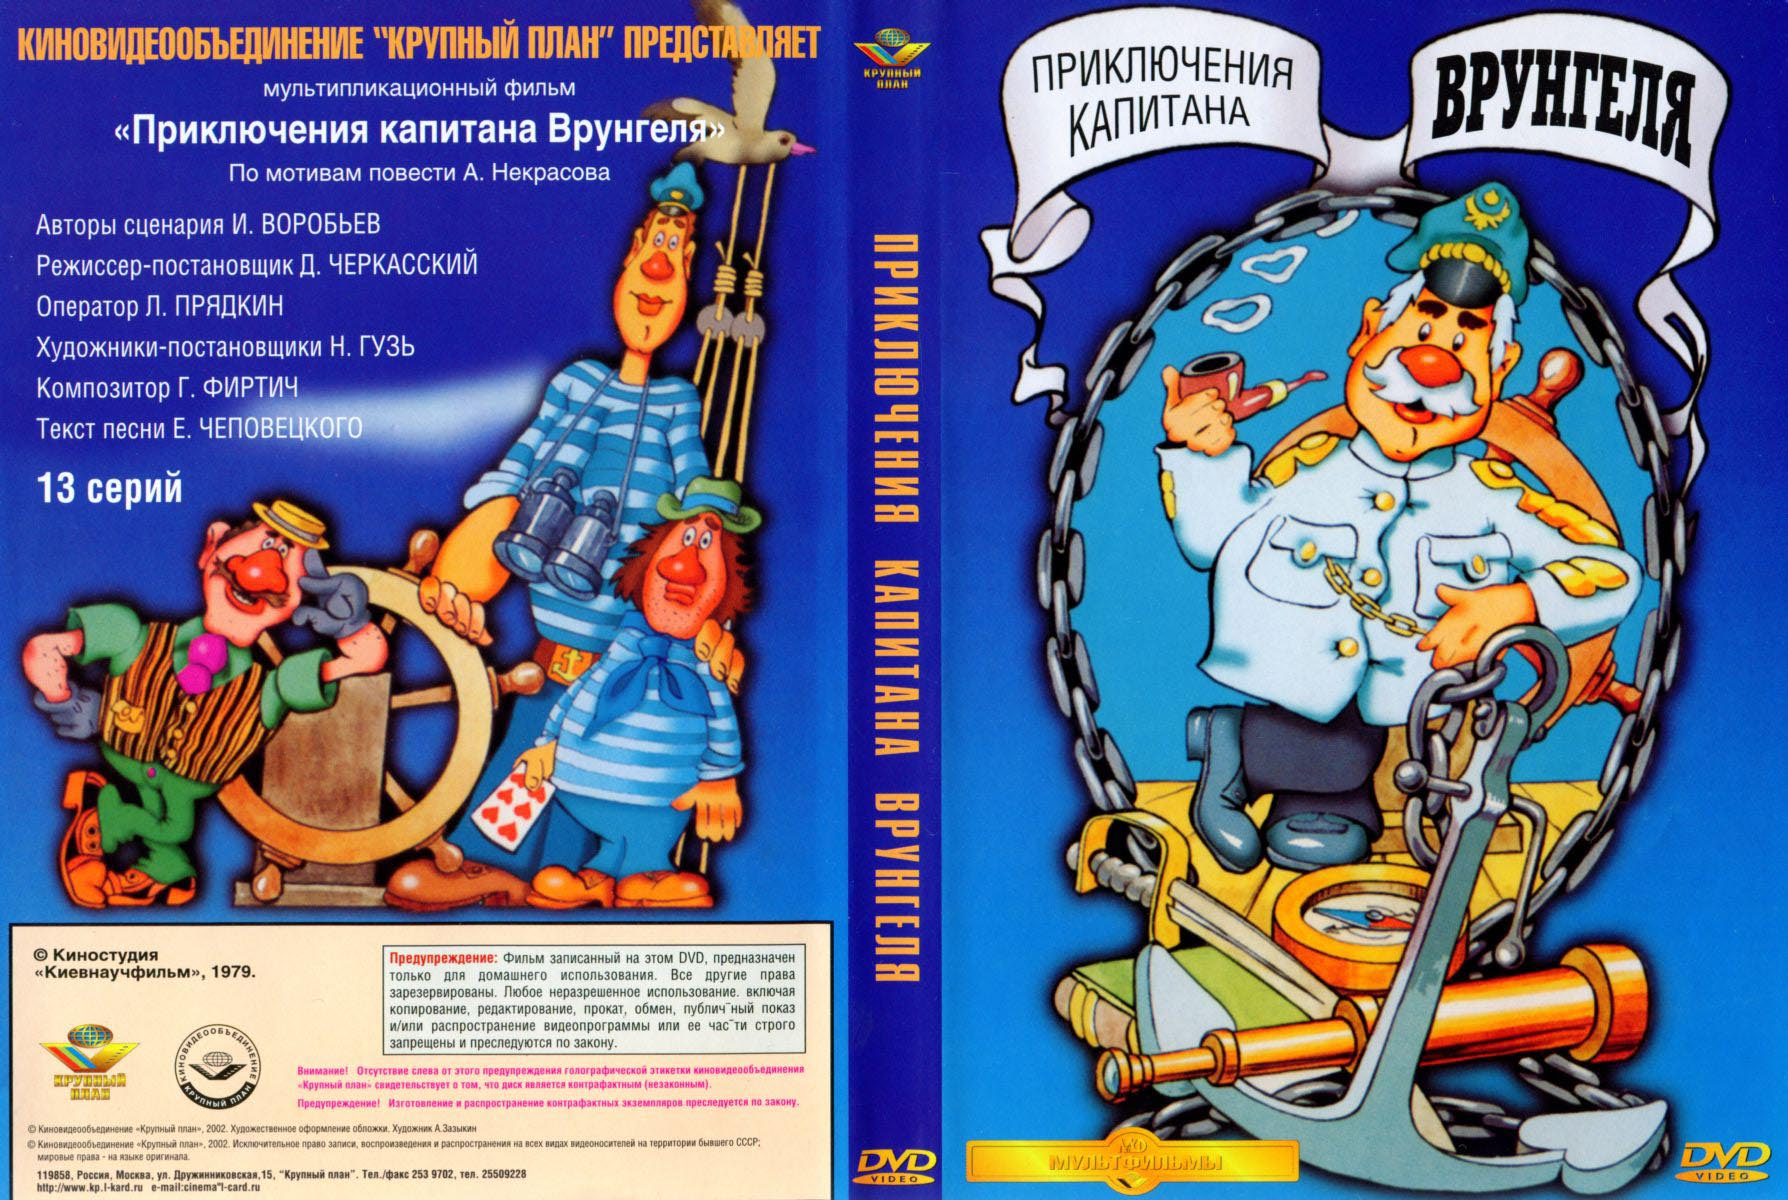 http://dvdrip-covers.narod.ru/covers/kap_vrungel_front.jpg